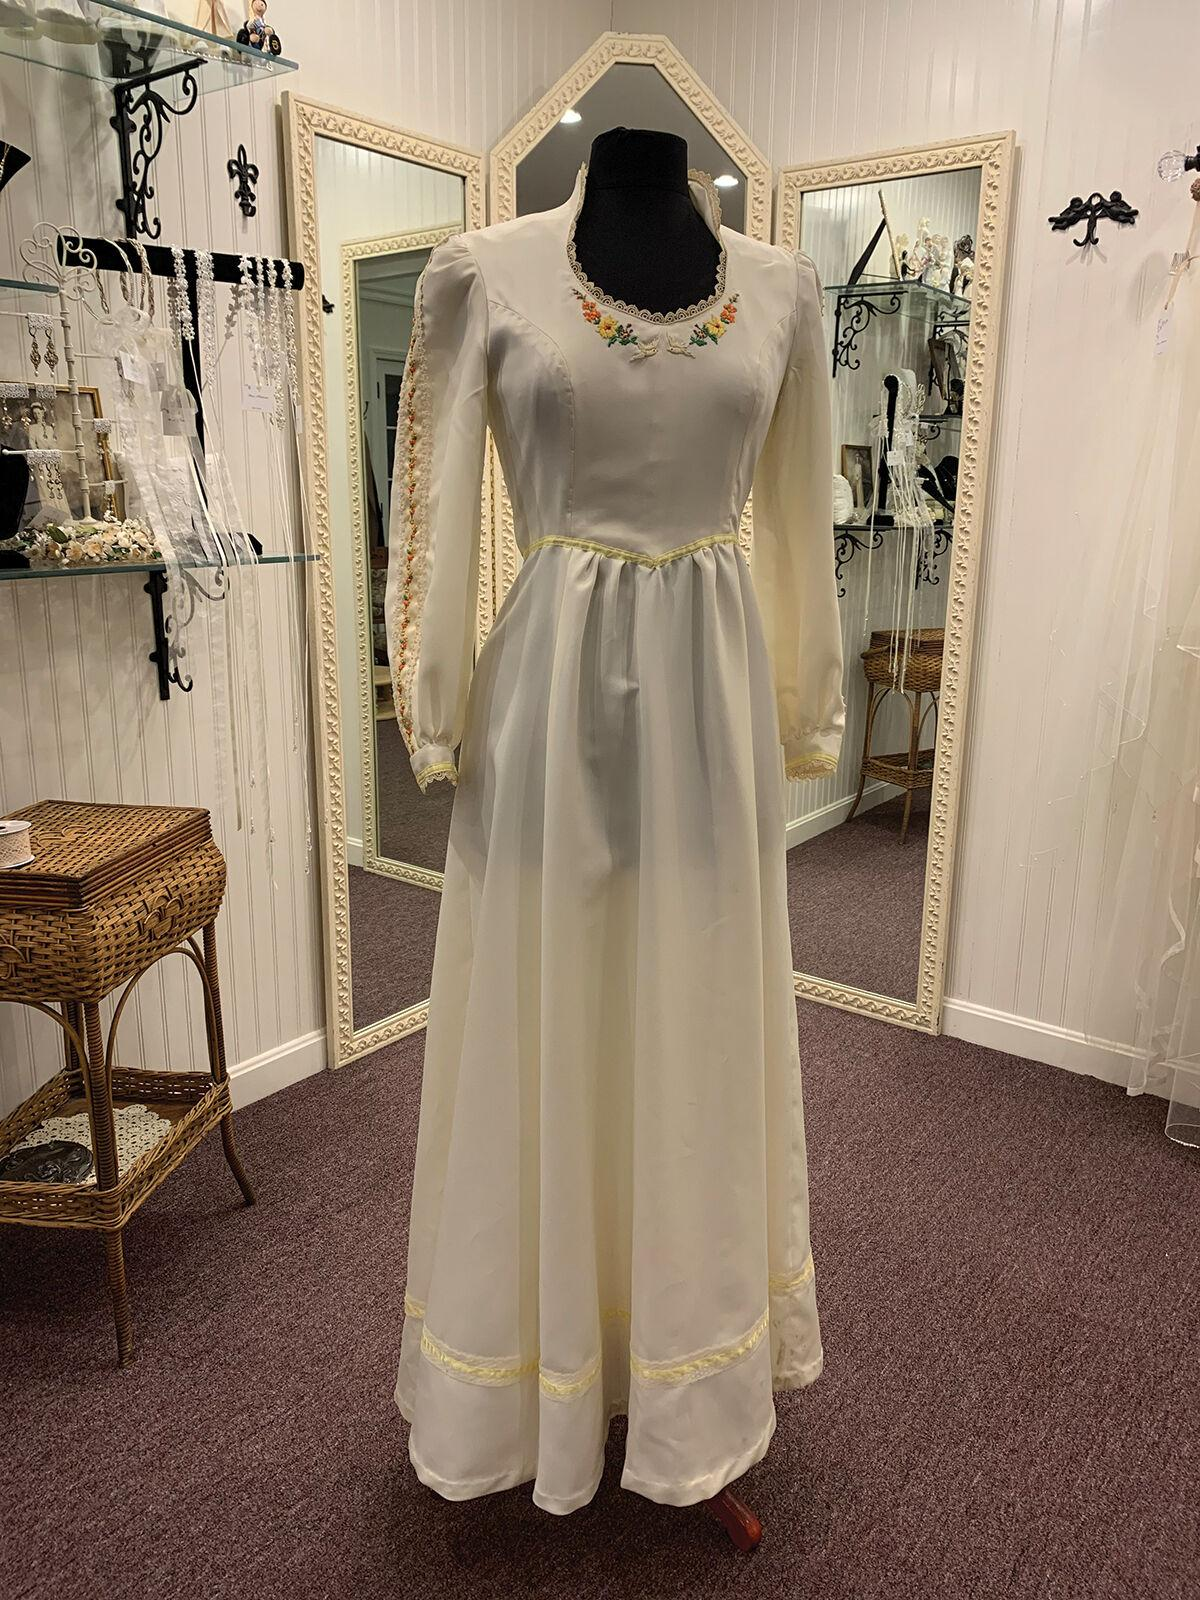 Betsy Nelson's wedding dress